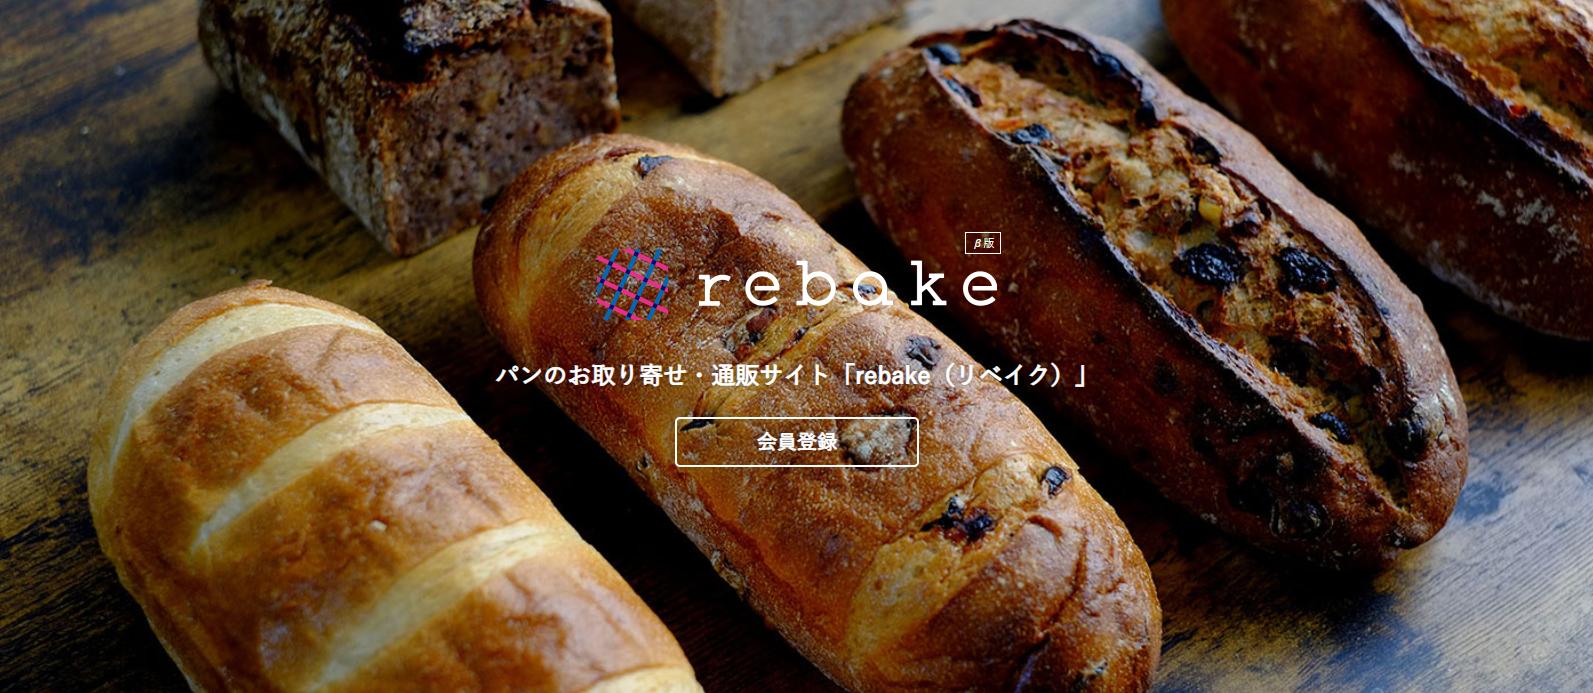 Rebake フードロス 食品ロス 会社